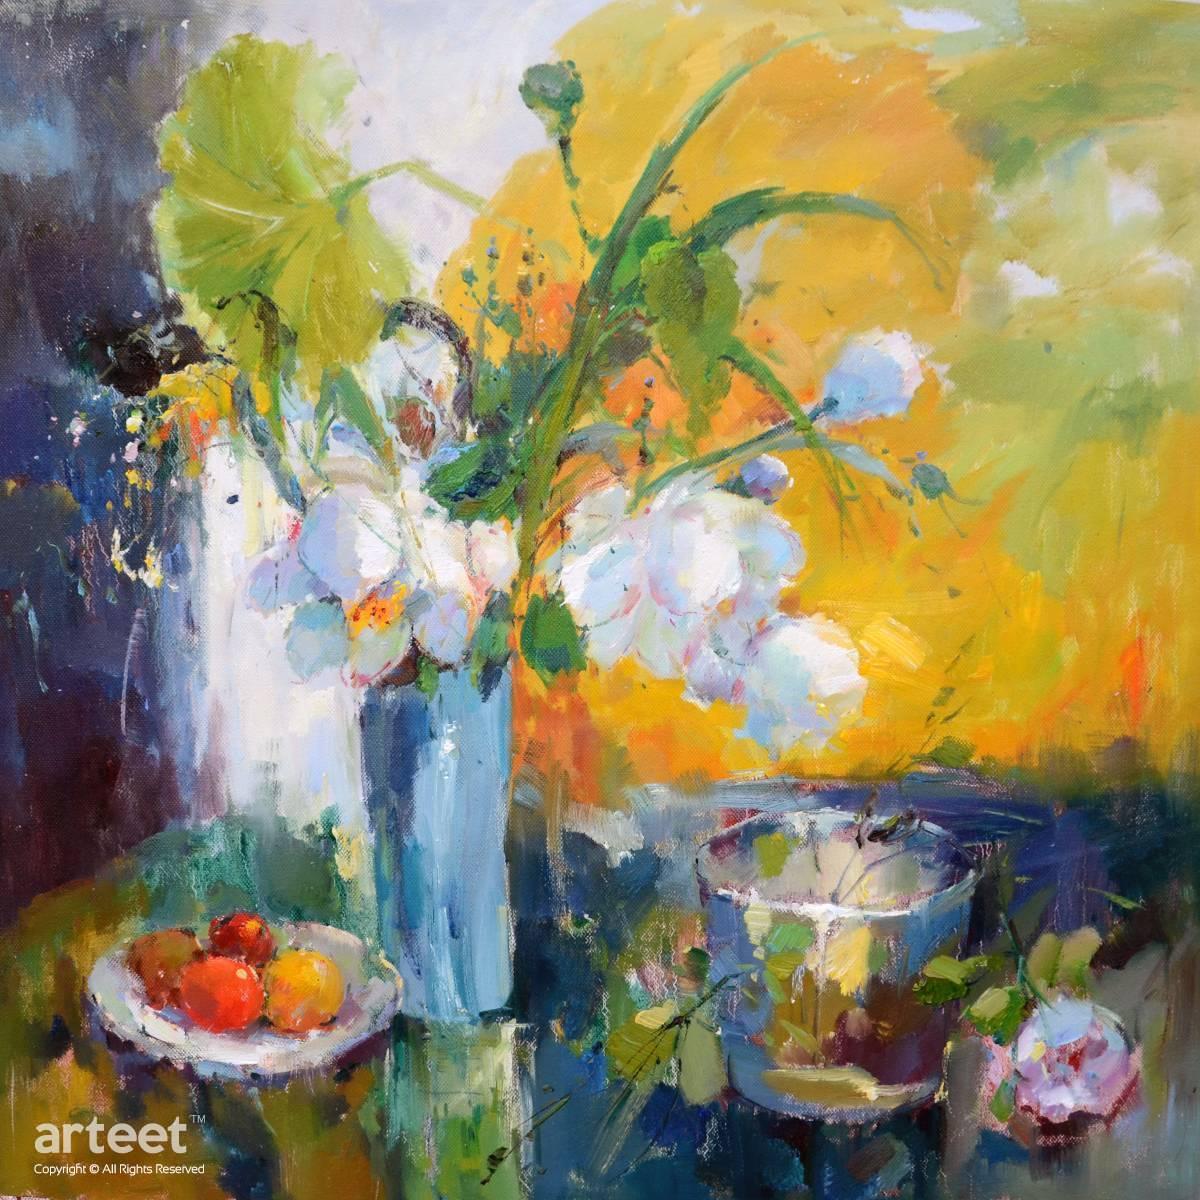 Still Life Flower & Objects Oil Paintings On Canvas - Arteet Gallery